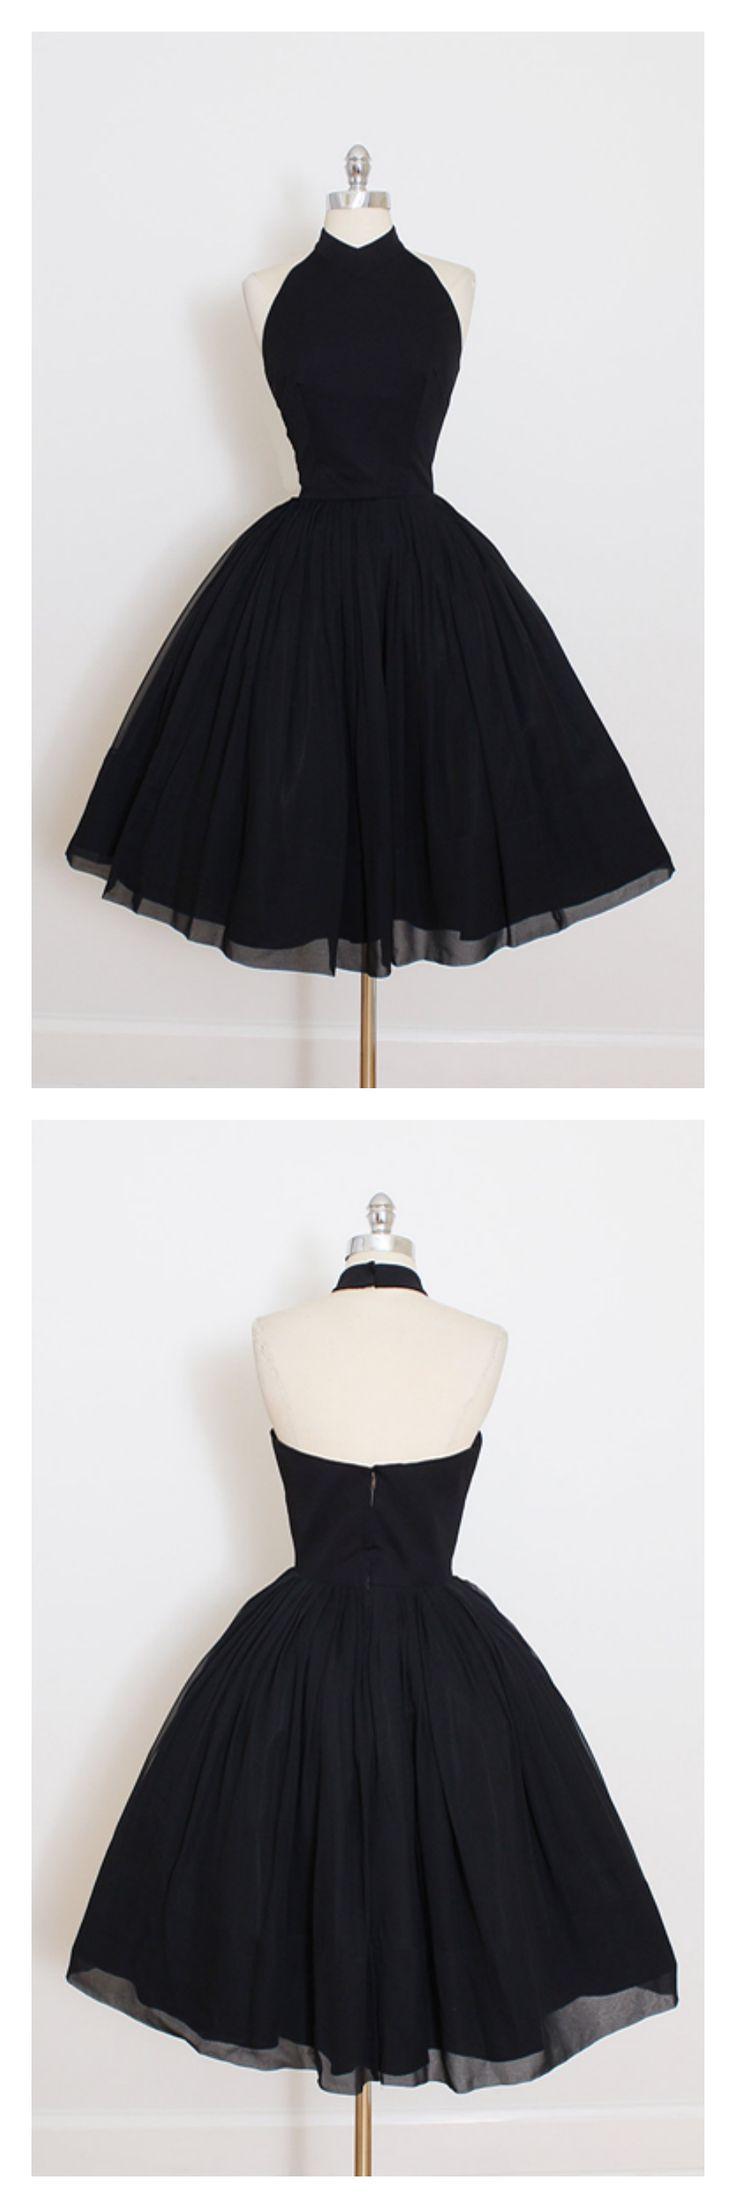 black short prom dresses, 2017 high neck homecoming dresses, vintage party dresses